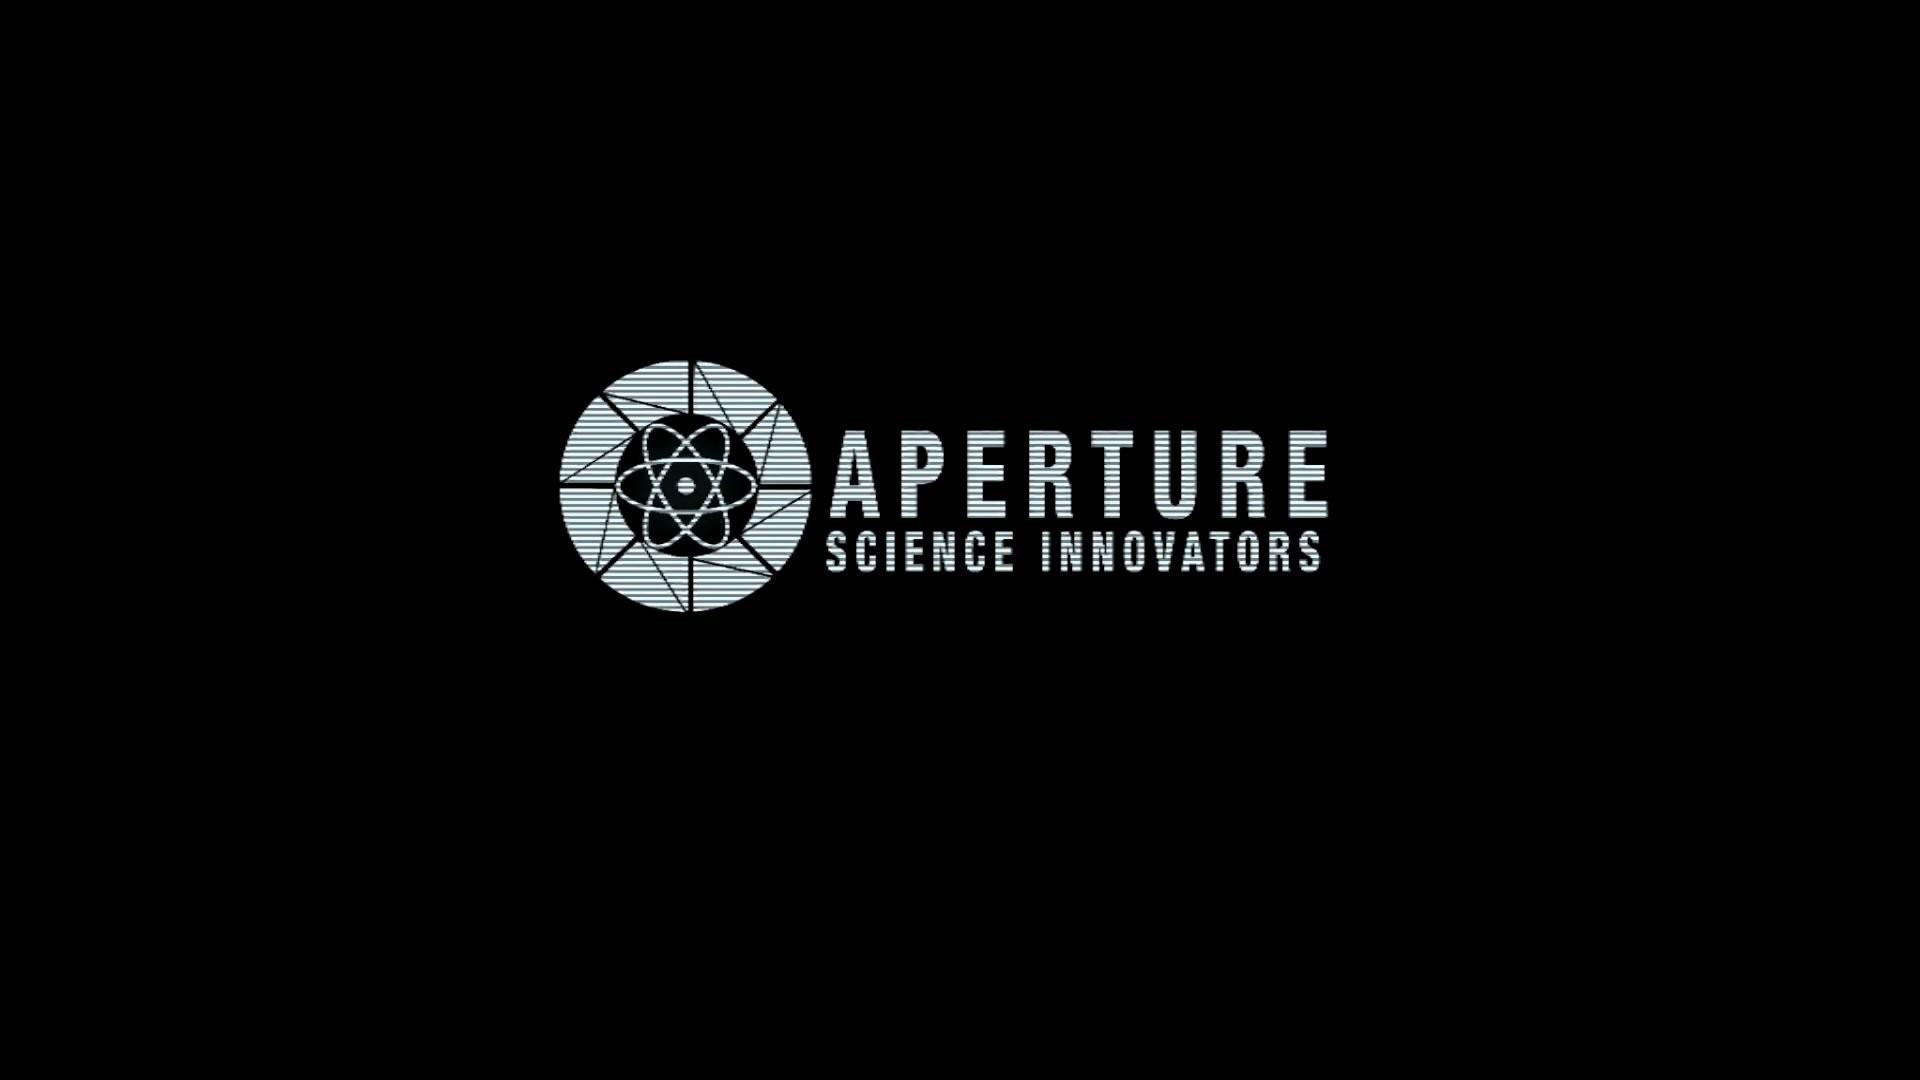 Aperture Science Innovators 790196 …